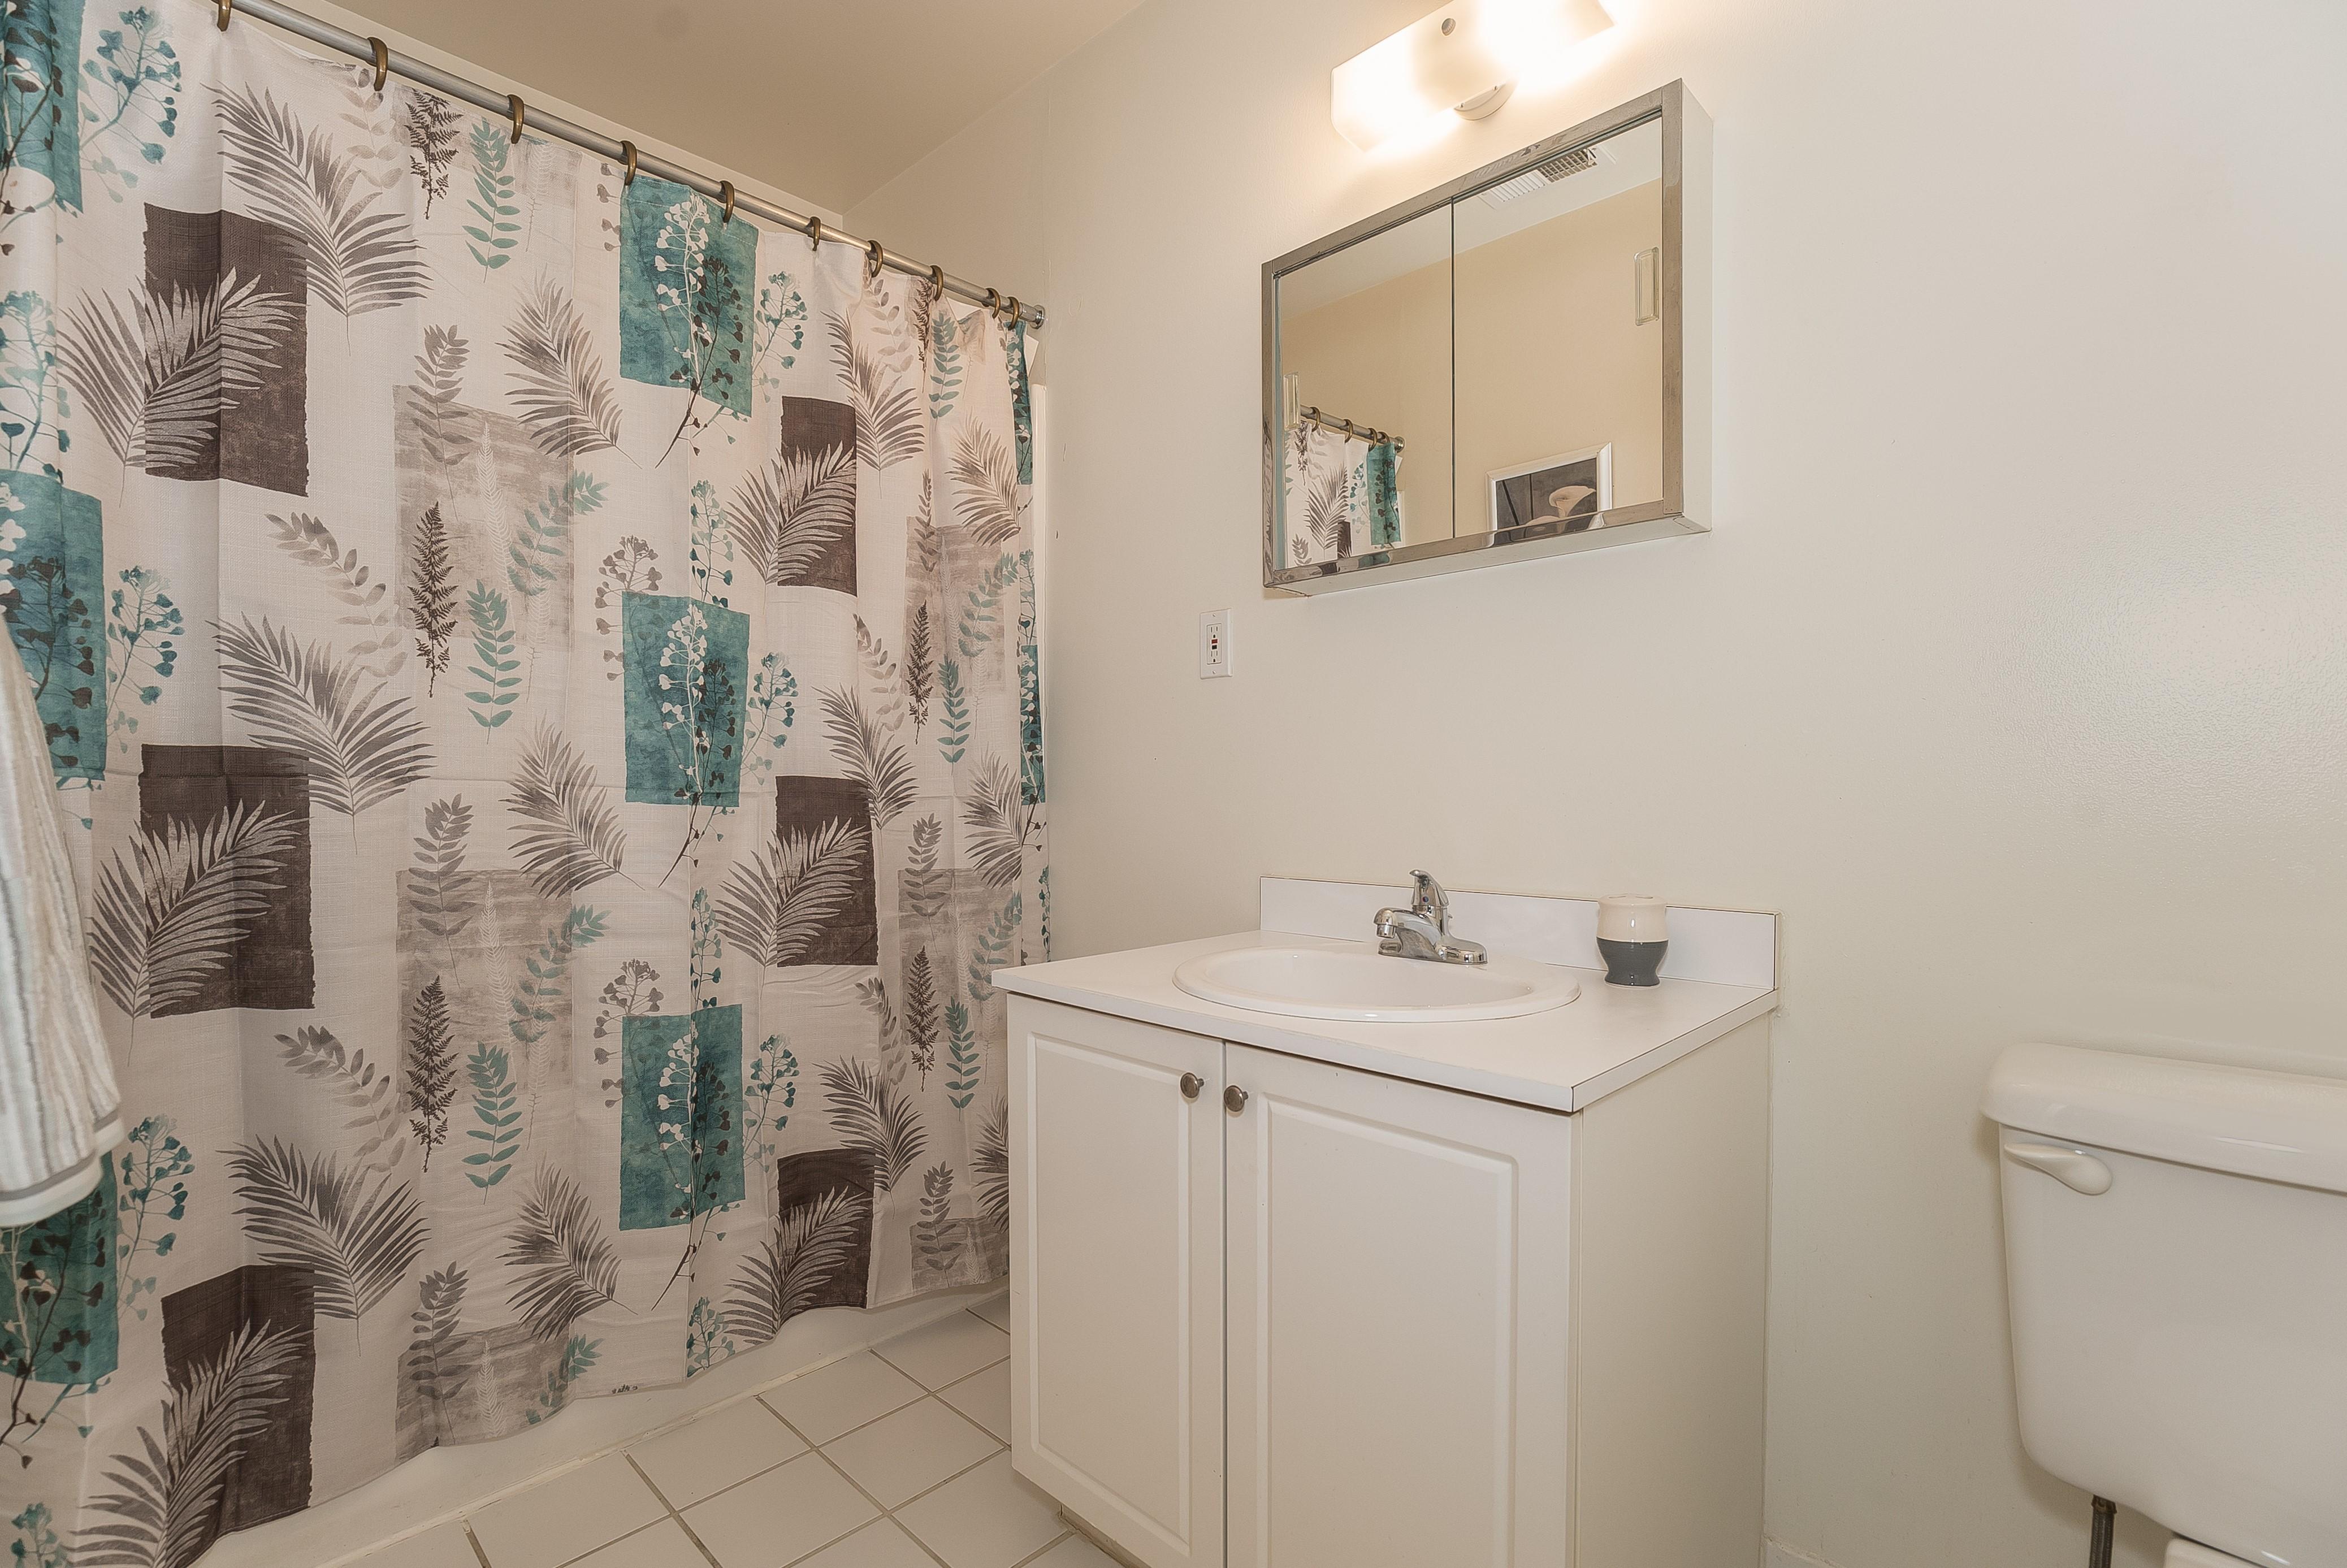 7-Short_Term_Housing_South_Plainfield_724_Bathroom